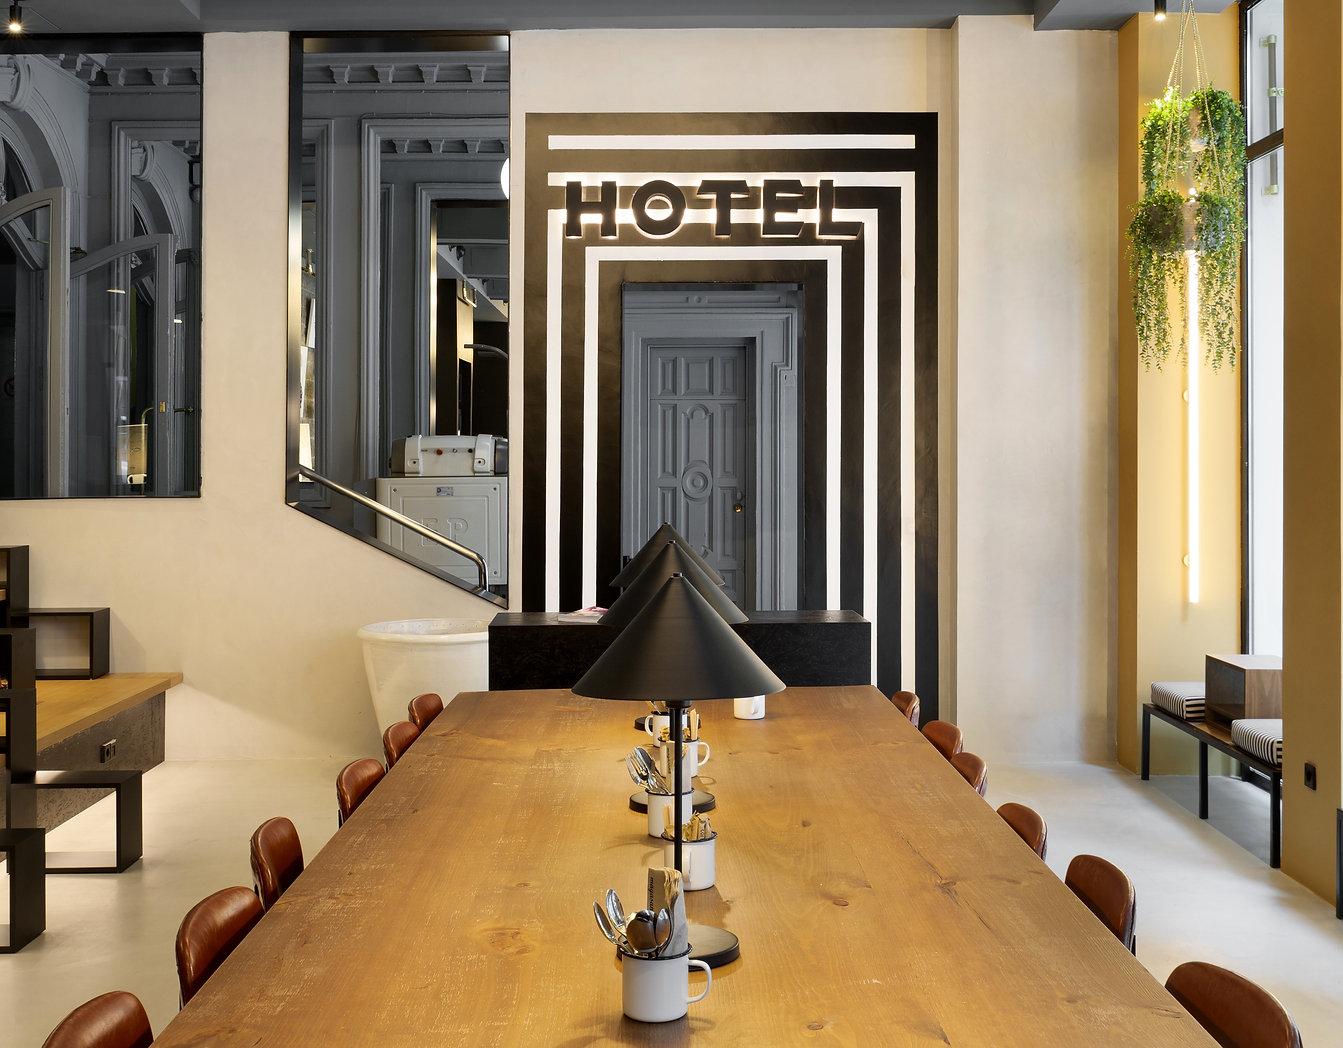 Chueca Petit Palace (Viajar) - GastroMad